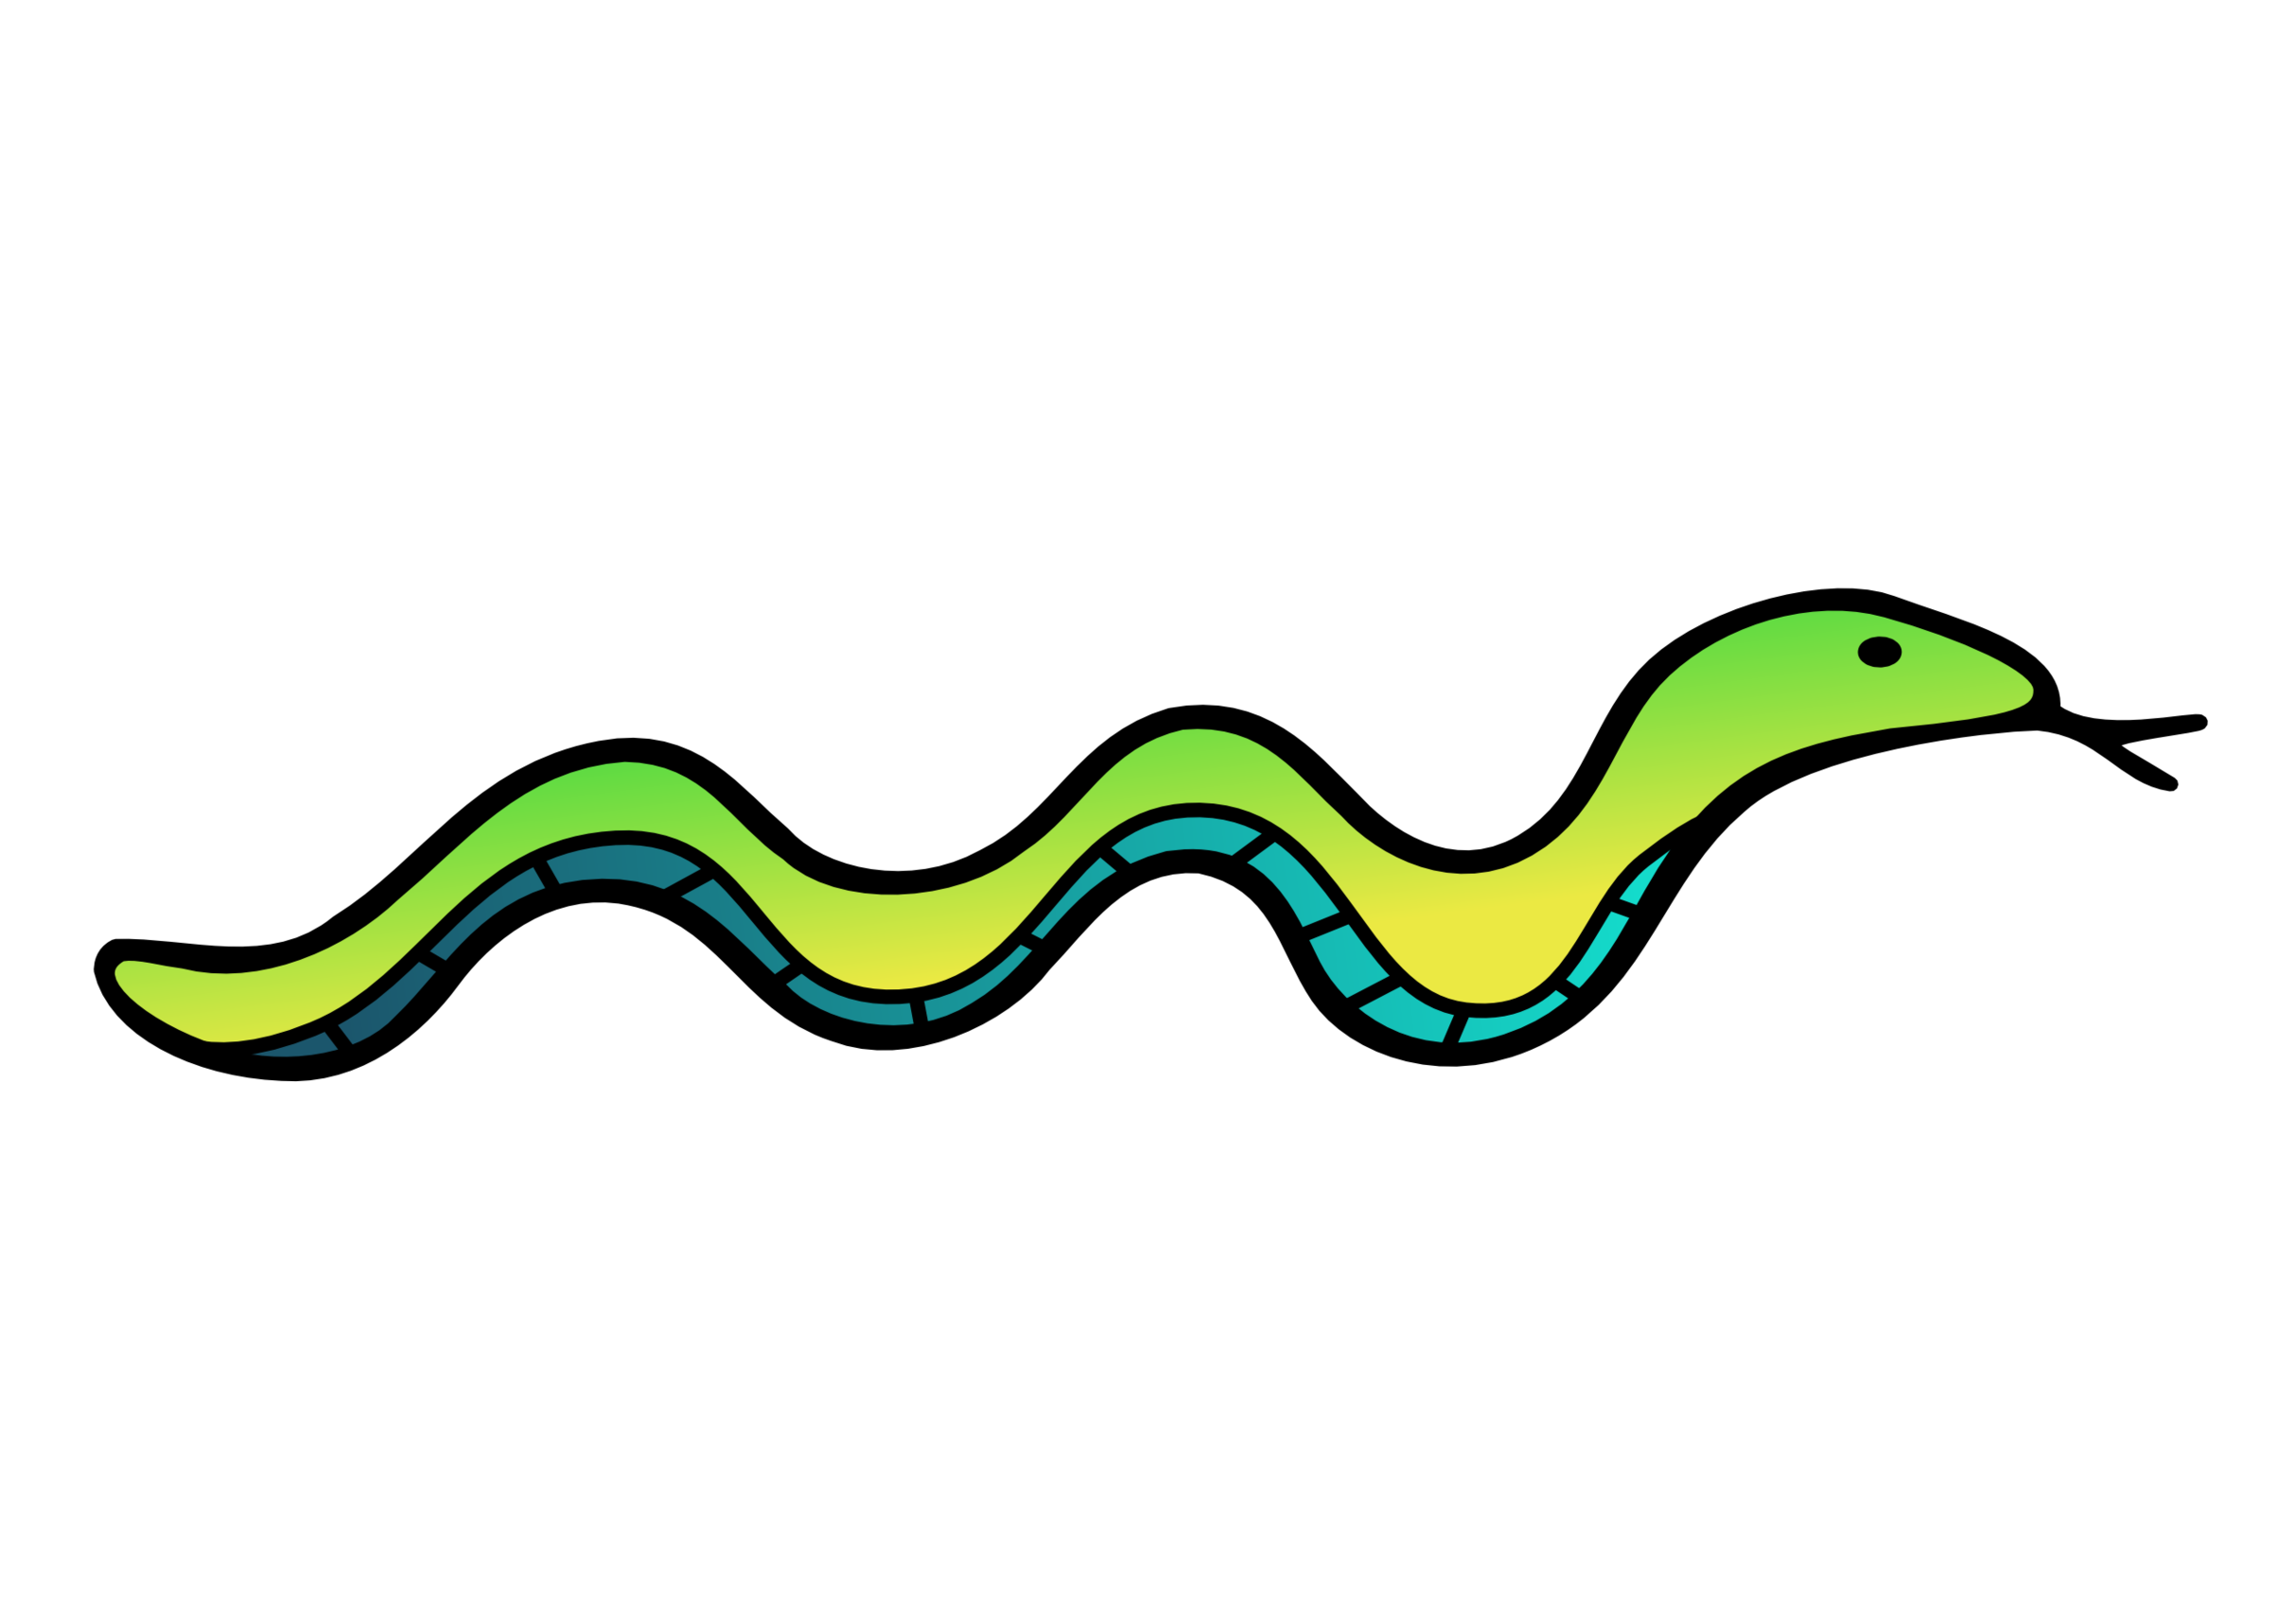 Cute snake clipart 3.